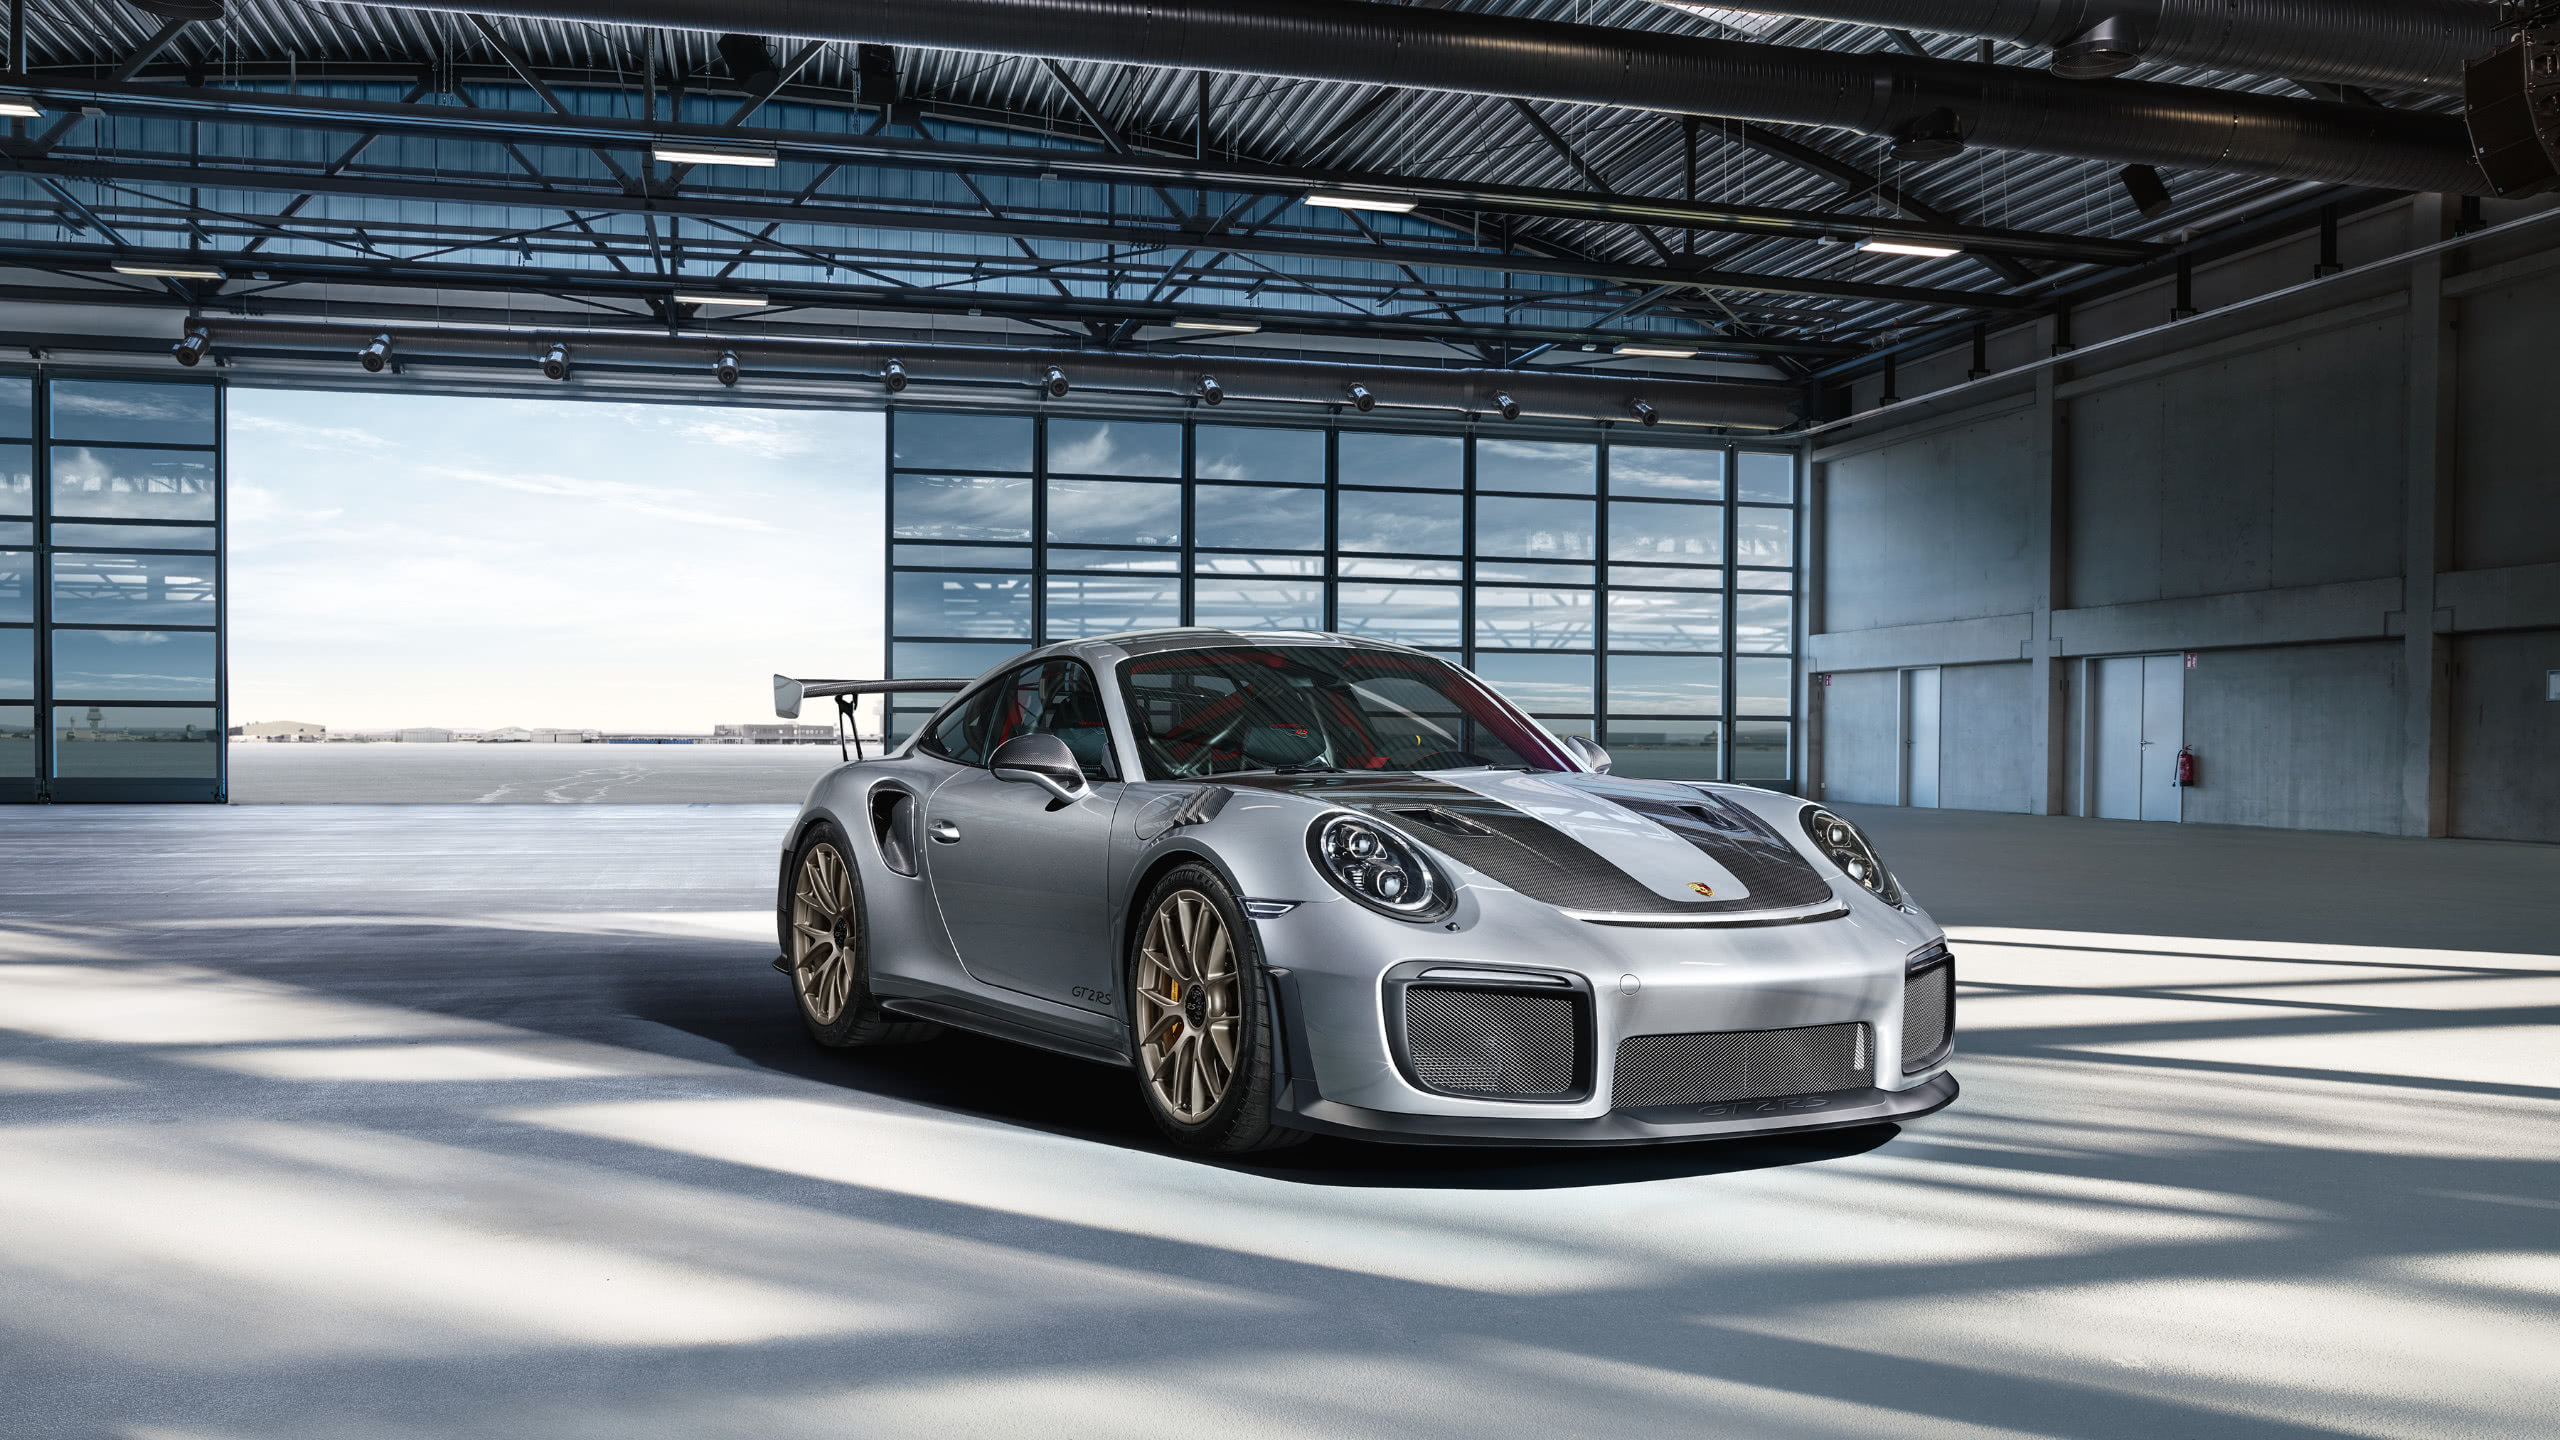 Porsche 911 GT2 RS WQHD 1440P Wallpaper Pixelz 2560x1440